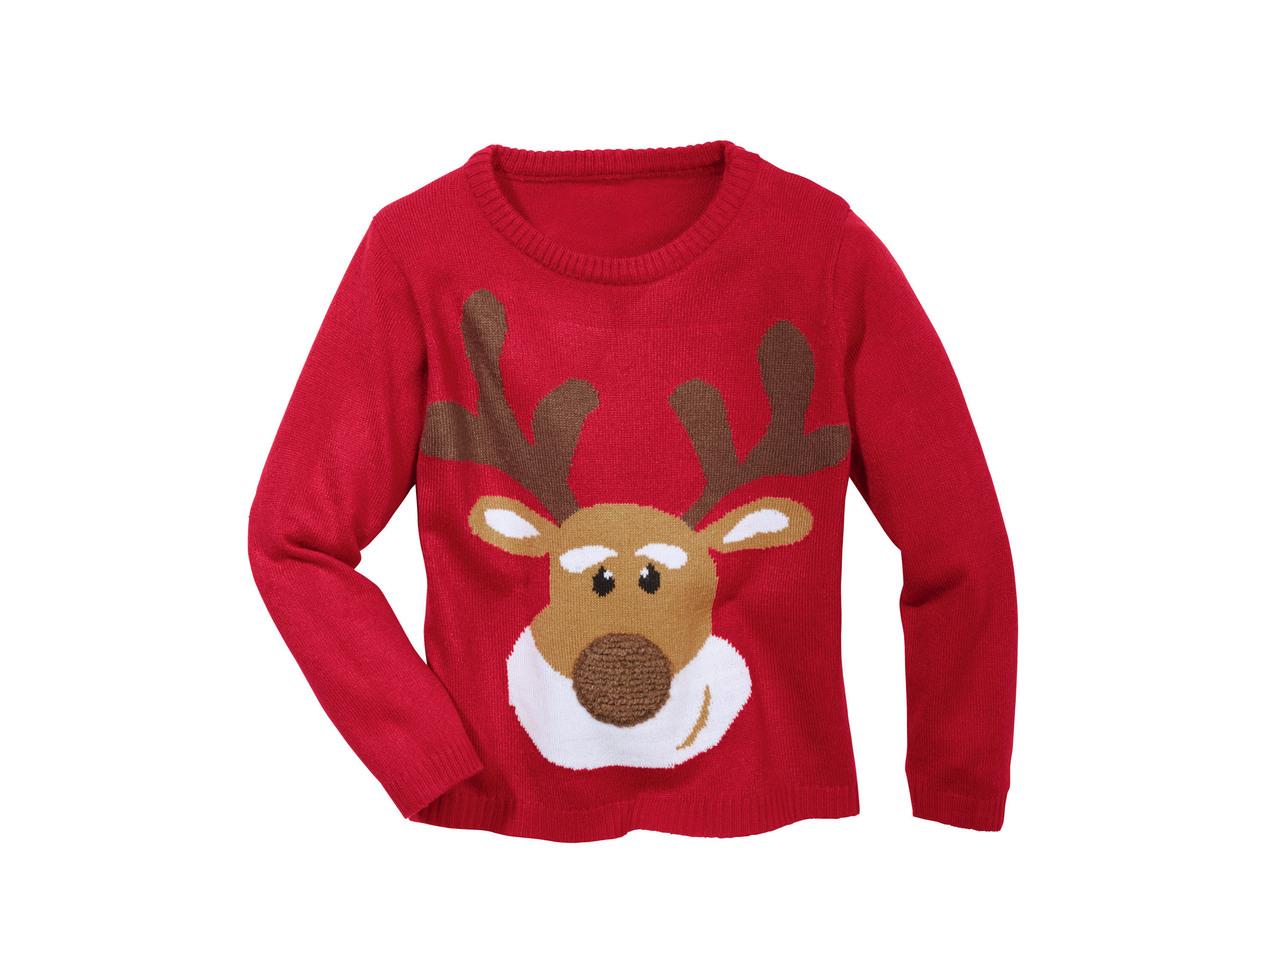 enorme sconto 81cef ce113 Boys' Christmas Pullover - Lidl — Malta - Specials archive